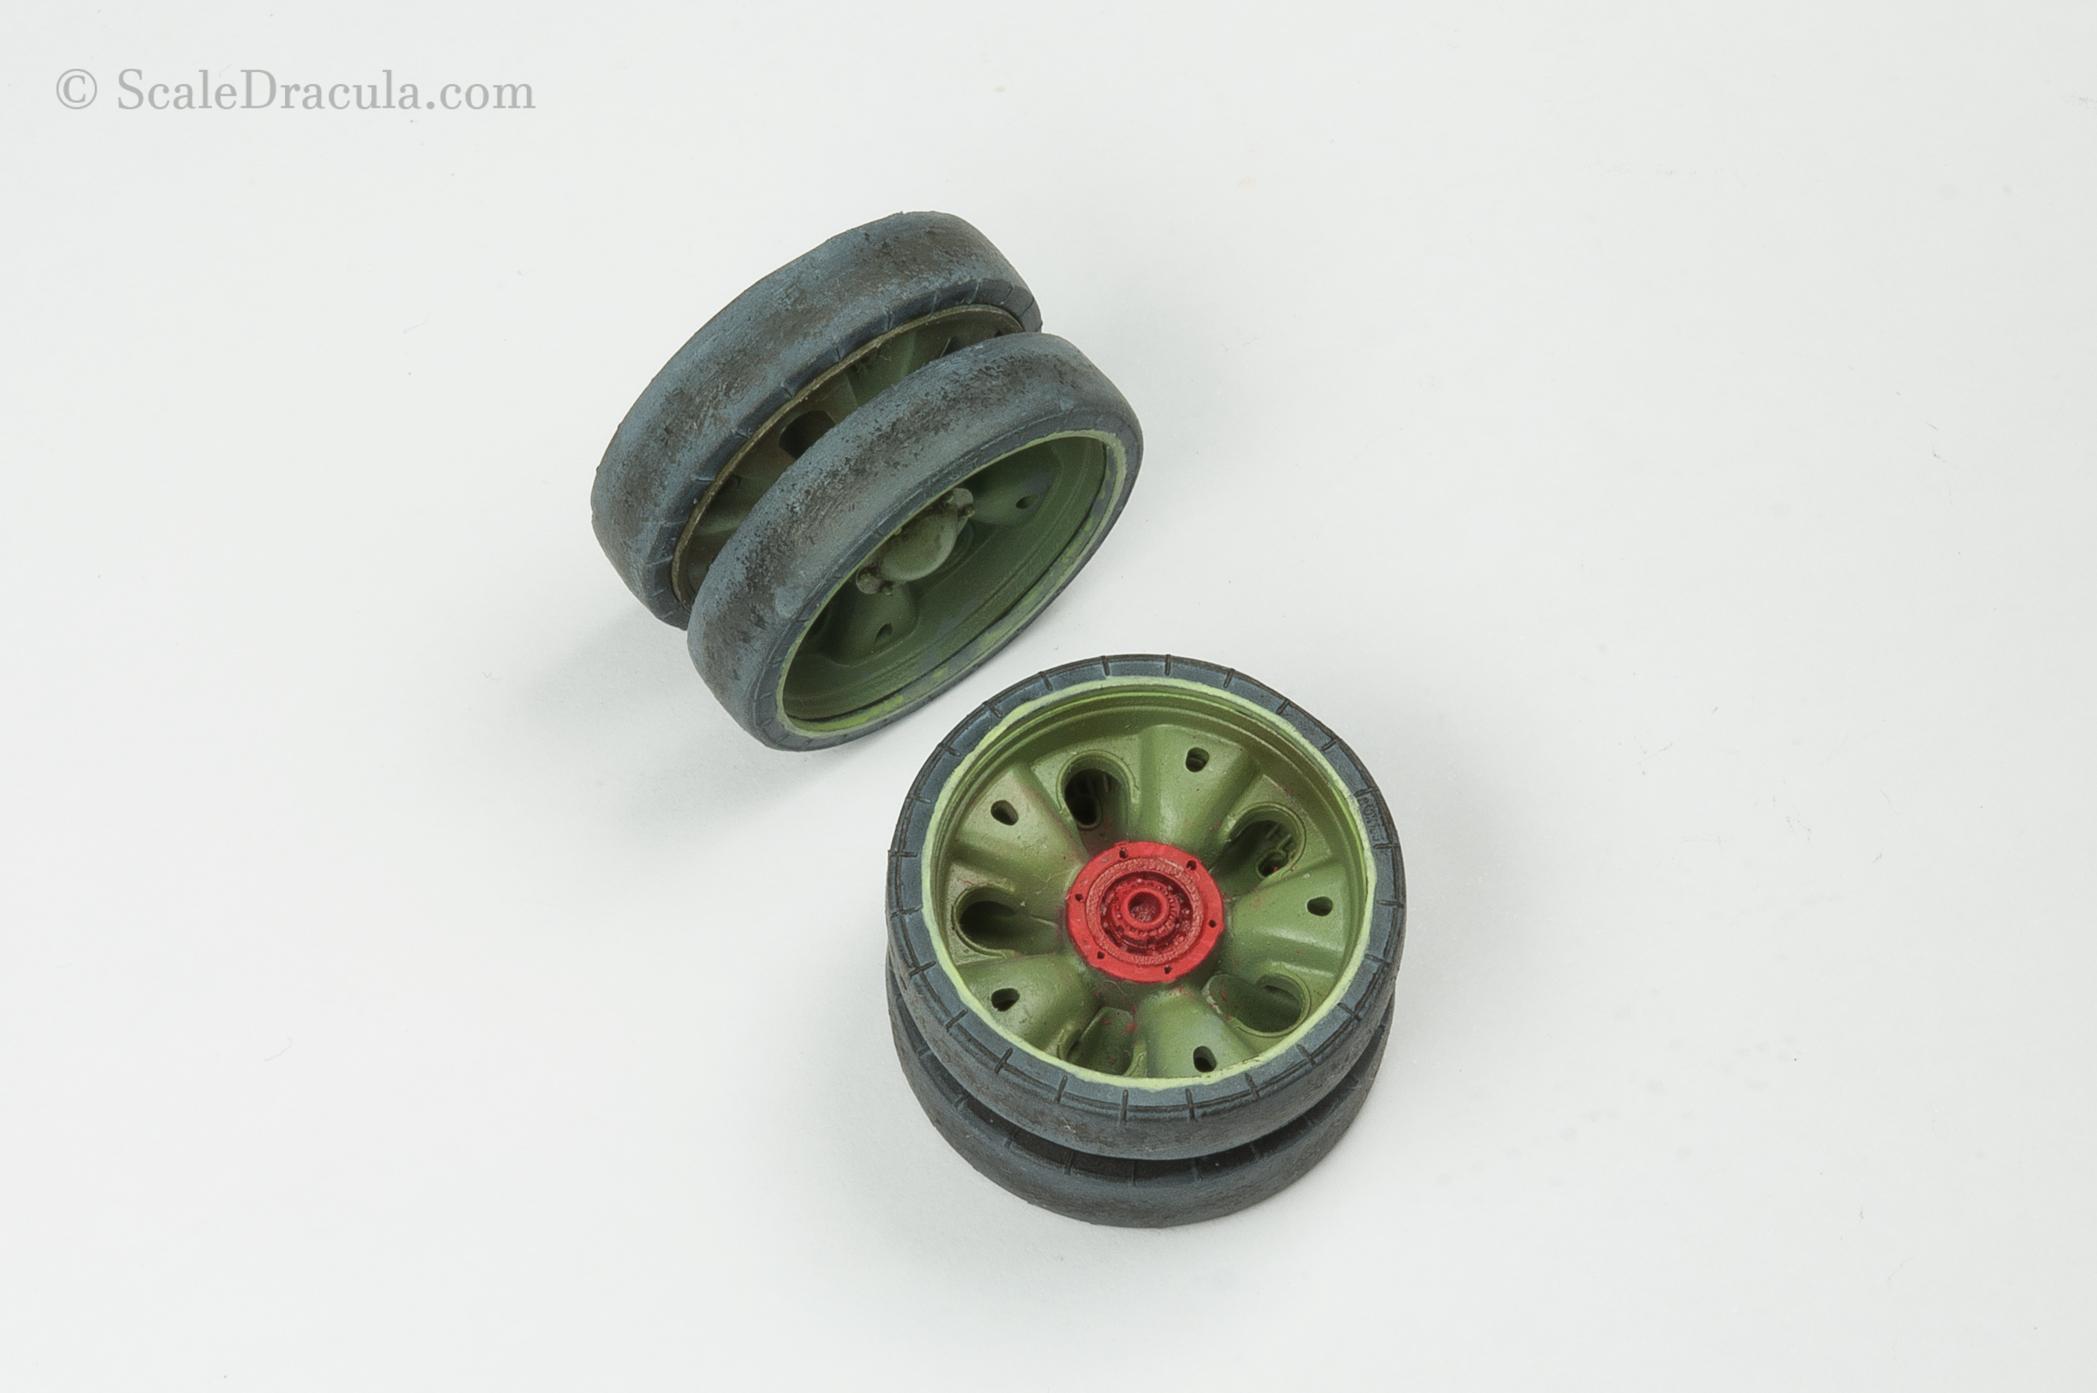 Painted wheeels, ZSU-57 by TAKOM